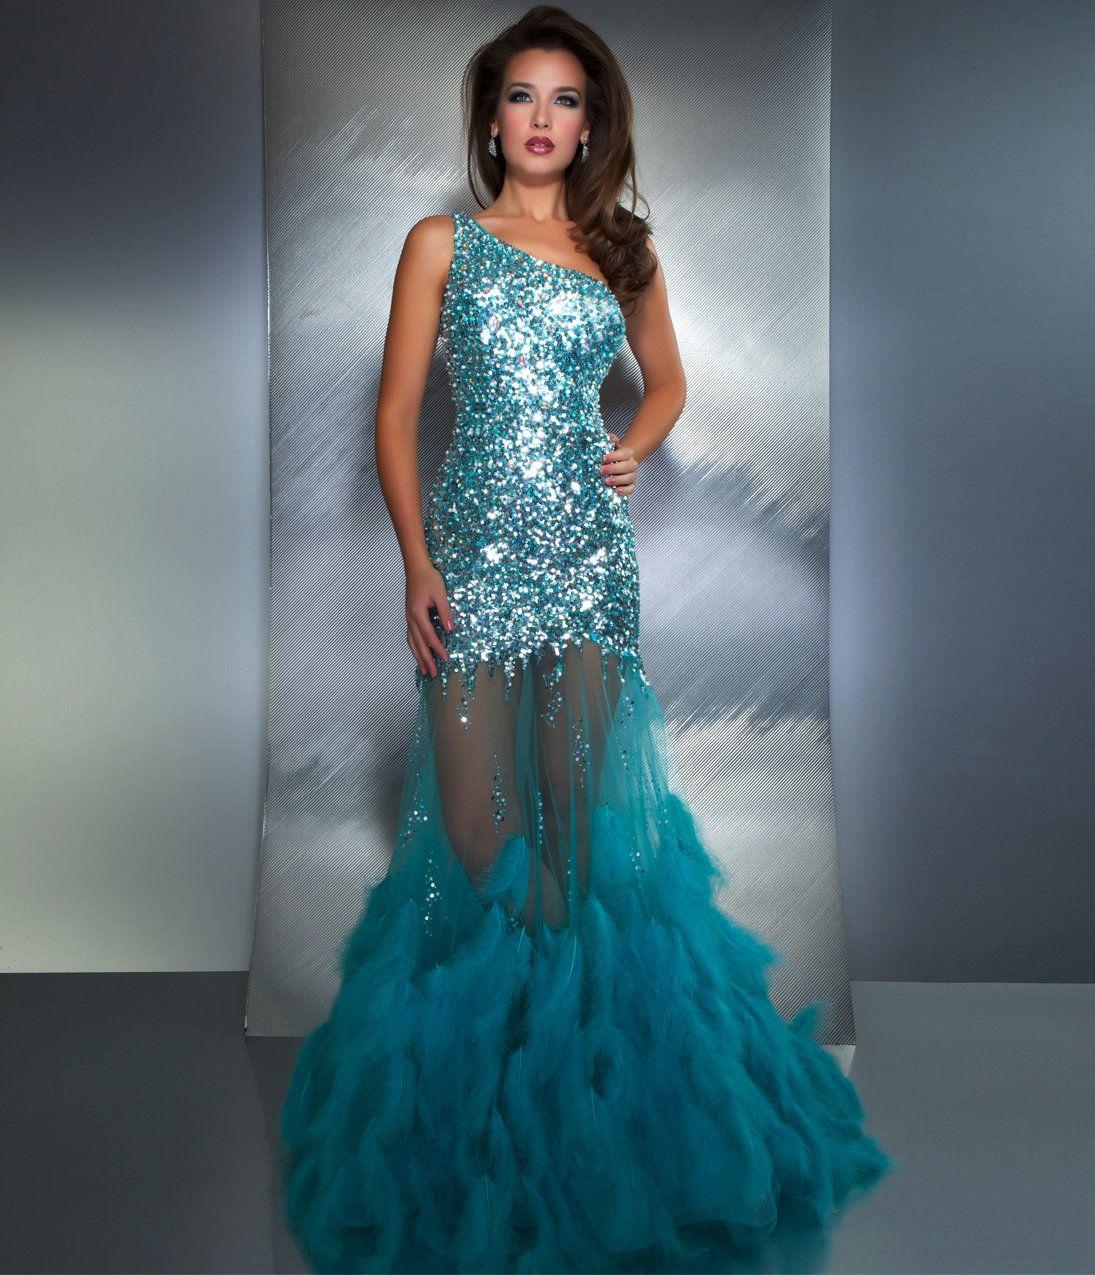 Mac Duggal Prom 2013 - Aqua One Shoulder Sequin Mermaid Prom Dress ...